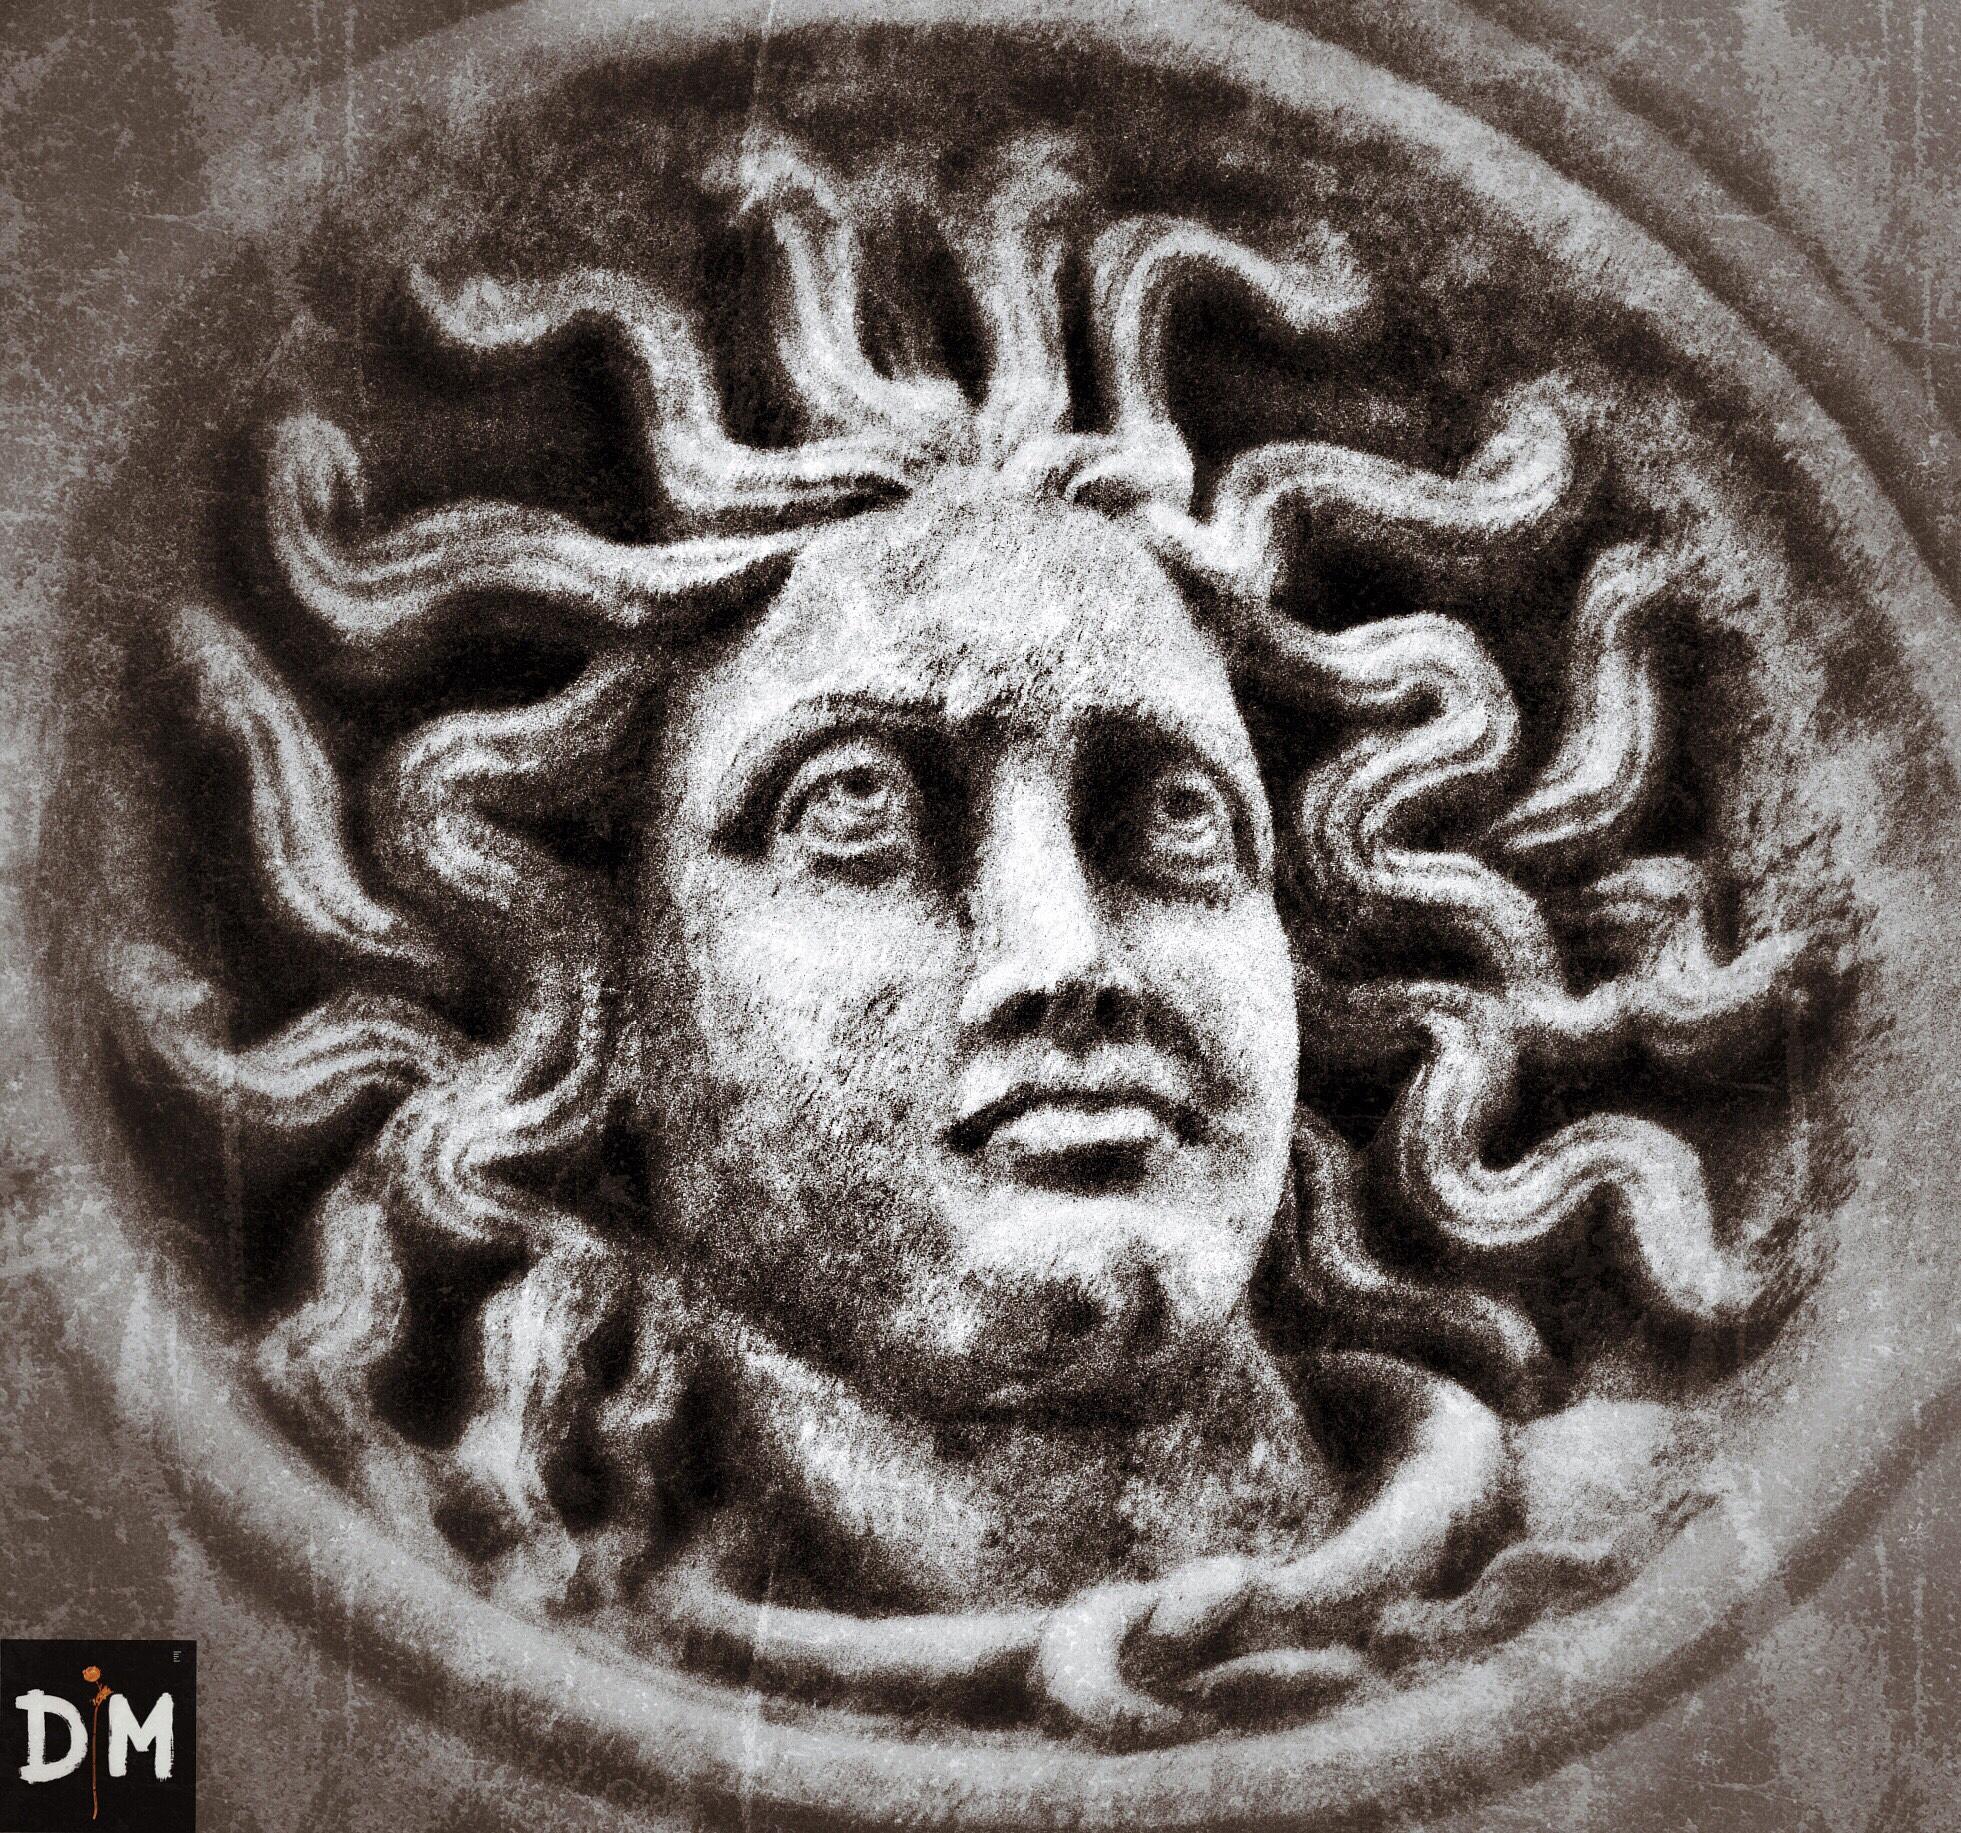 Medusa Head by D M